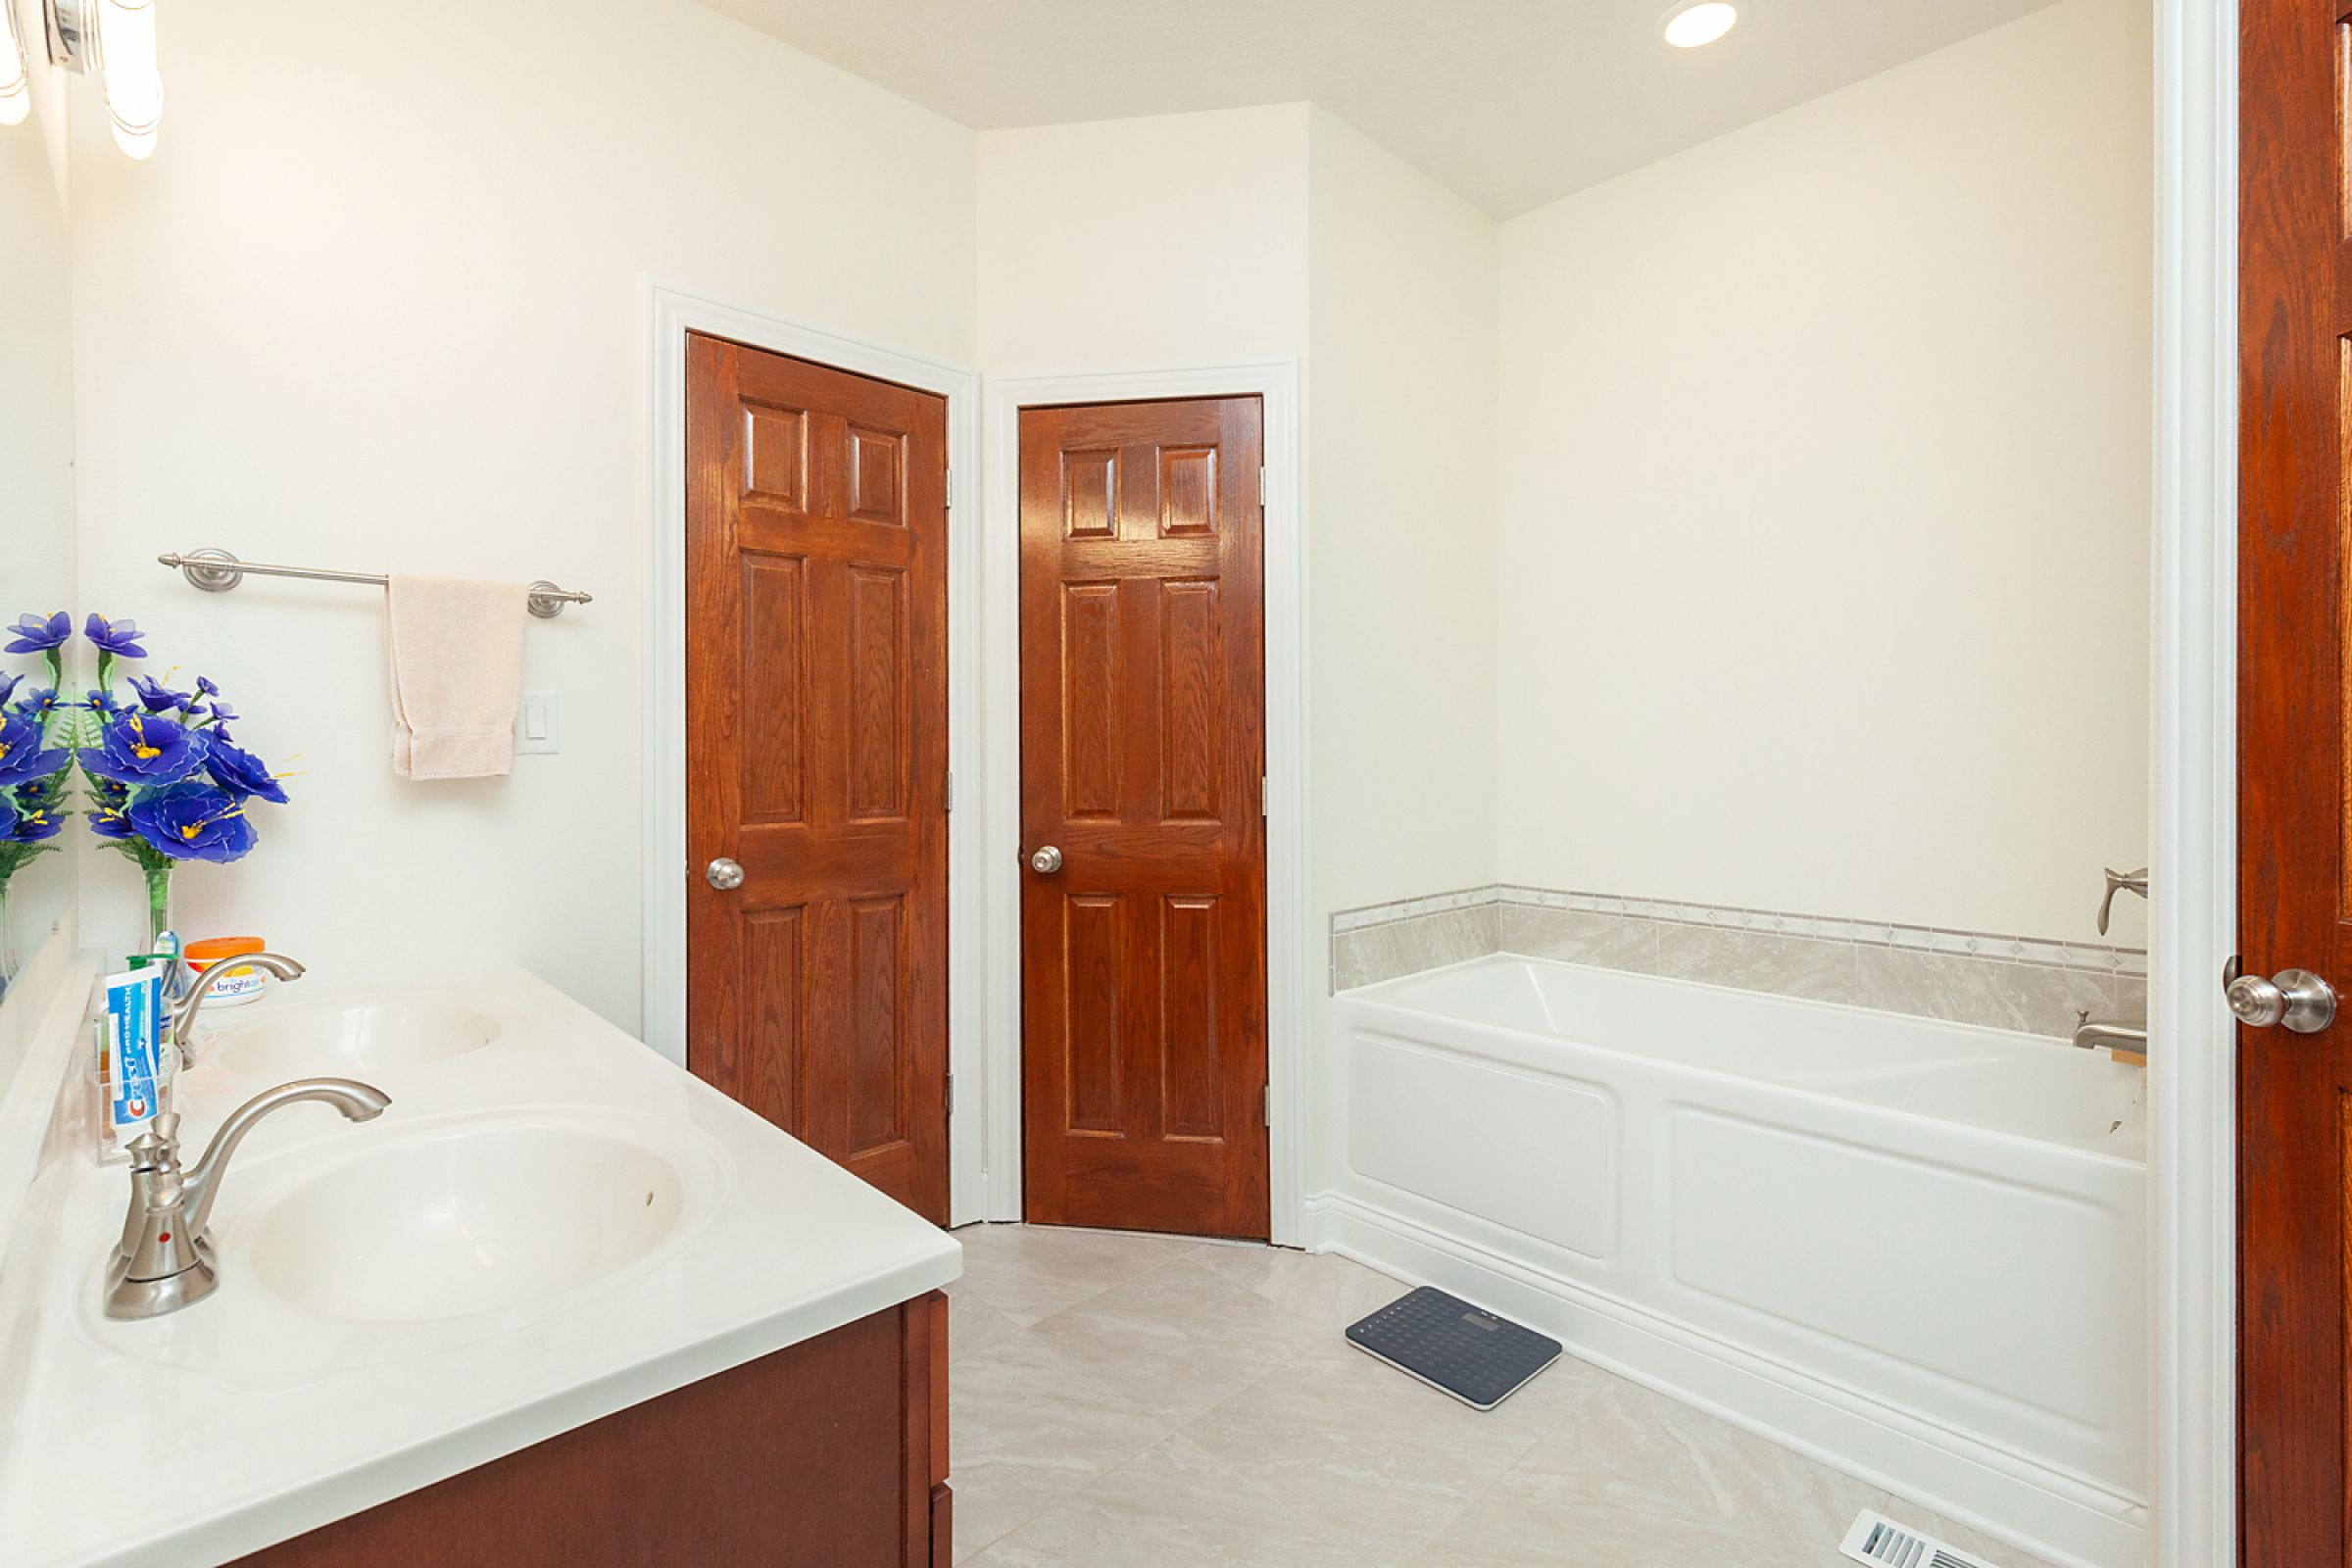 residential-polk-county-iowa-0-acres-listing-number-15403-1-2021-03-12-053950.jpg